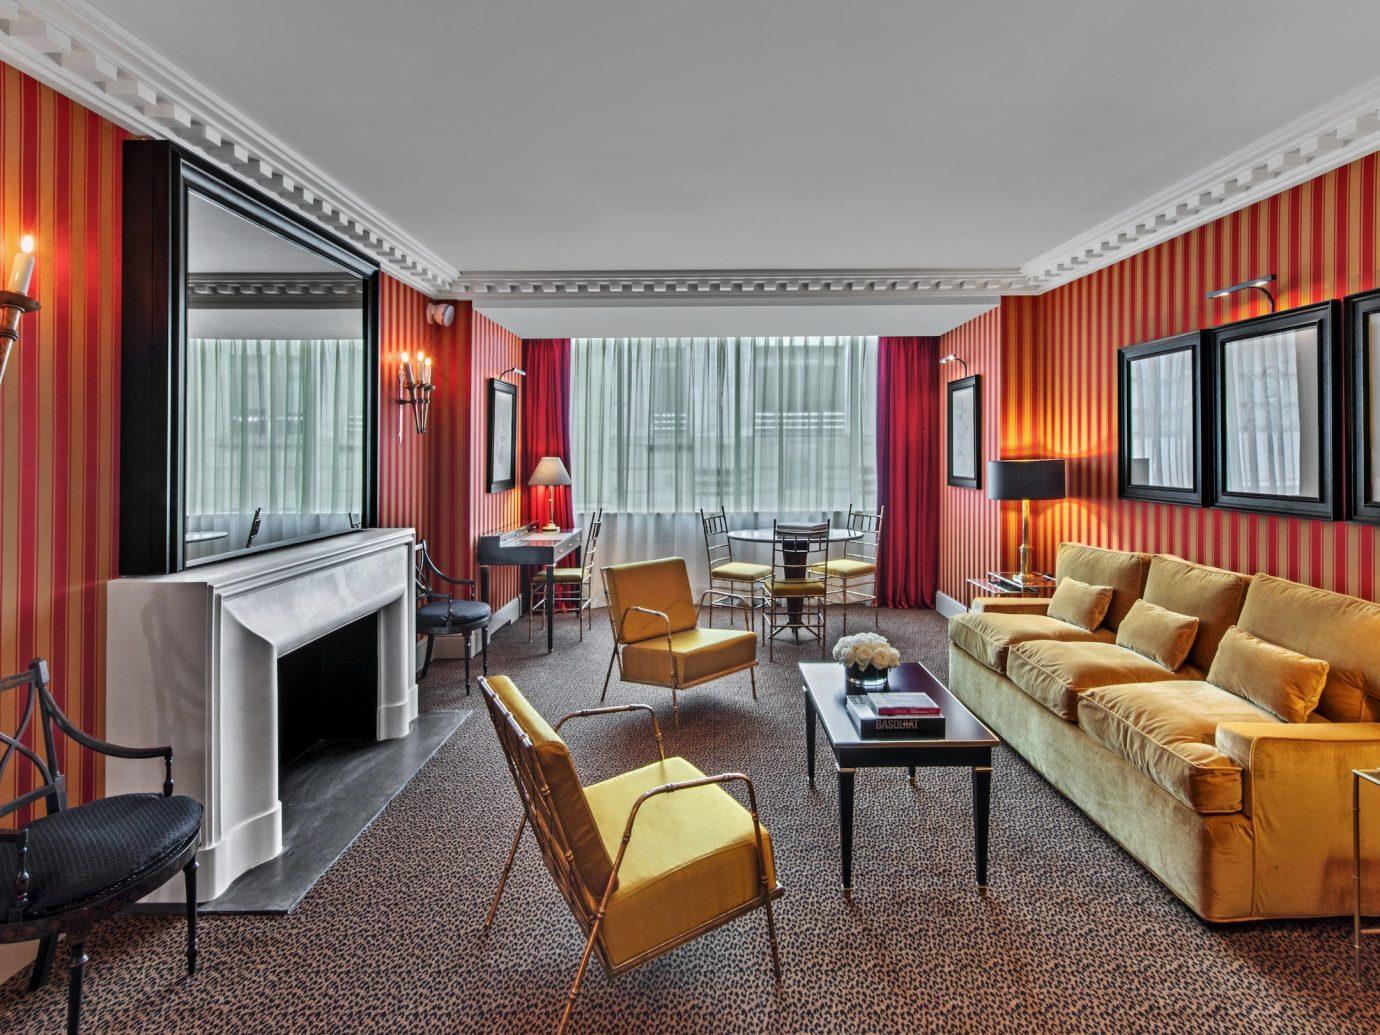 Suite view at the Hotel de Berri